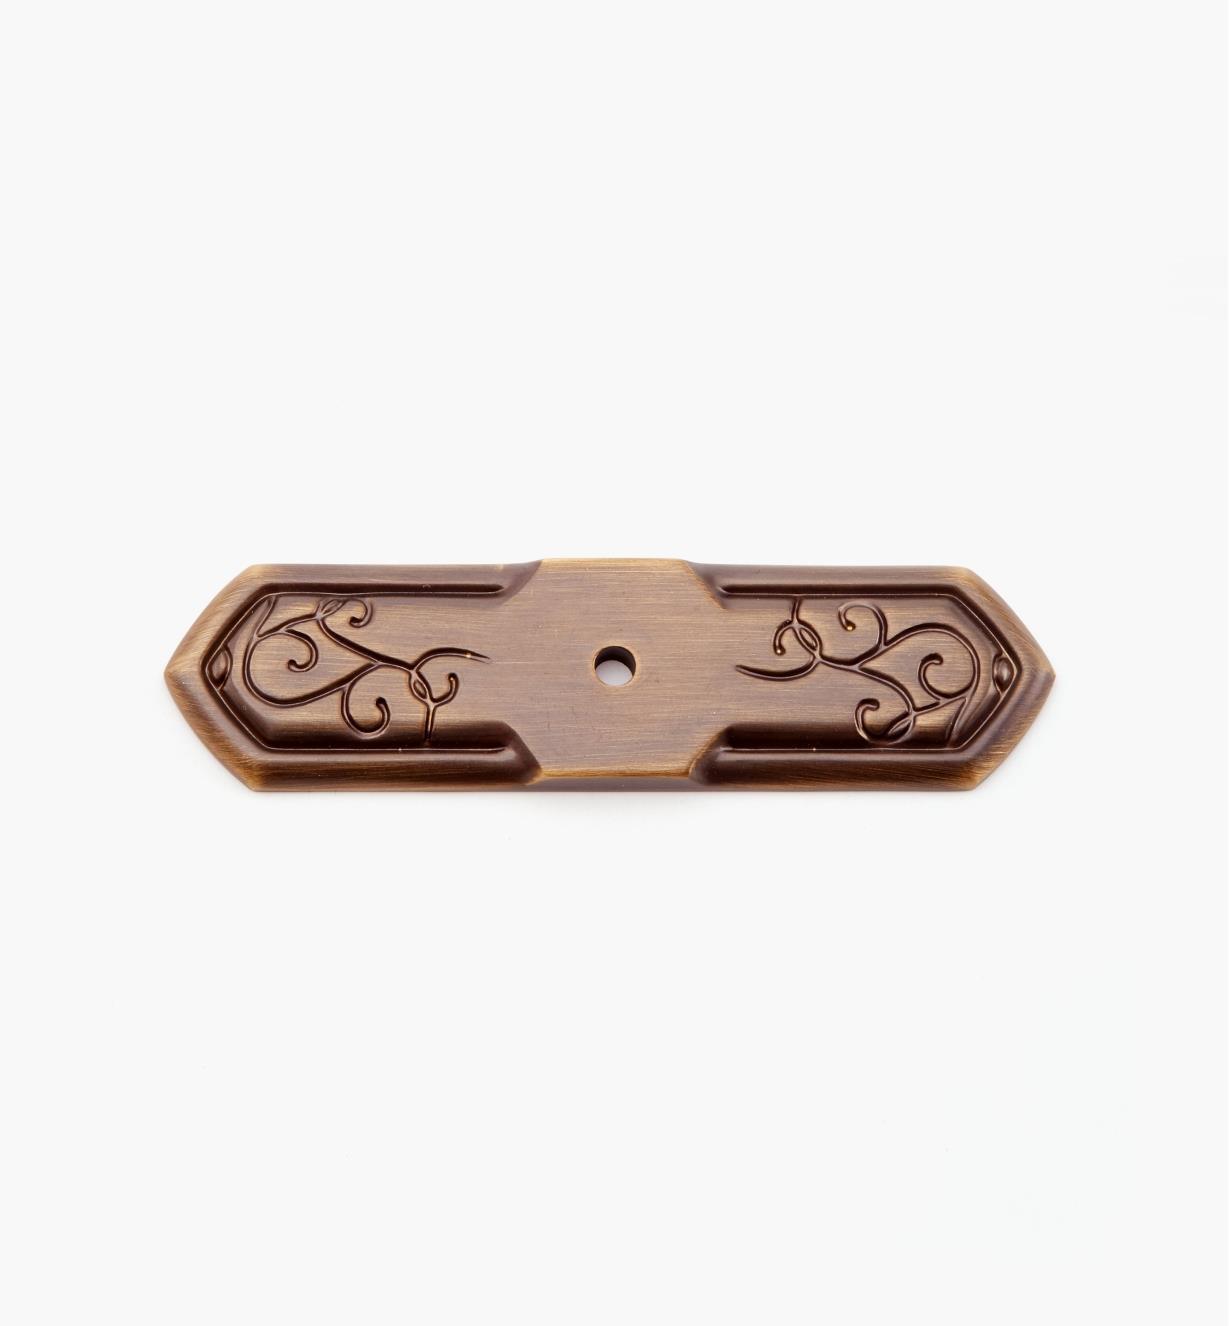 02A5213 - Platine de 1pox 37/8po, série Bella Forma, fini bronze bruni